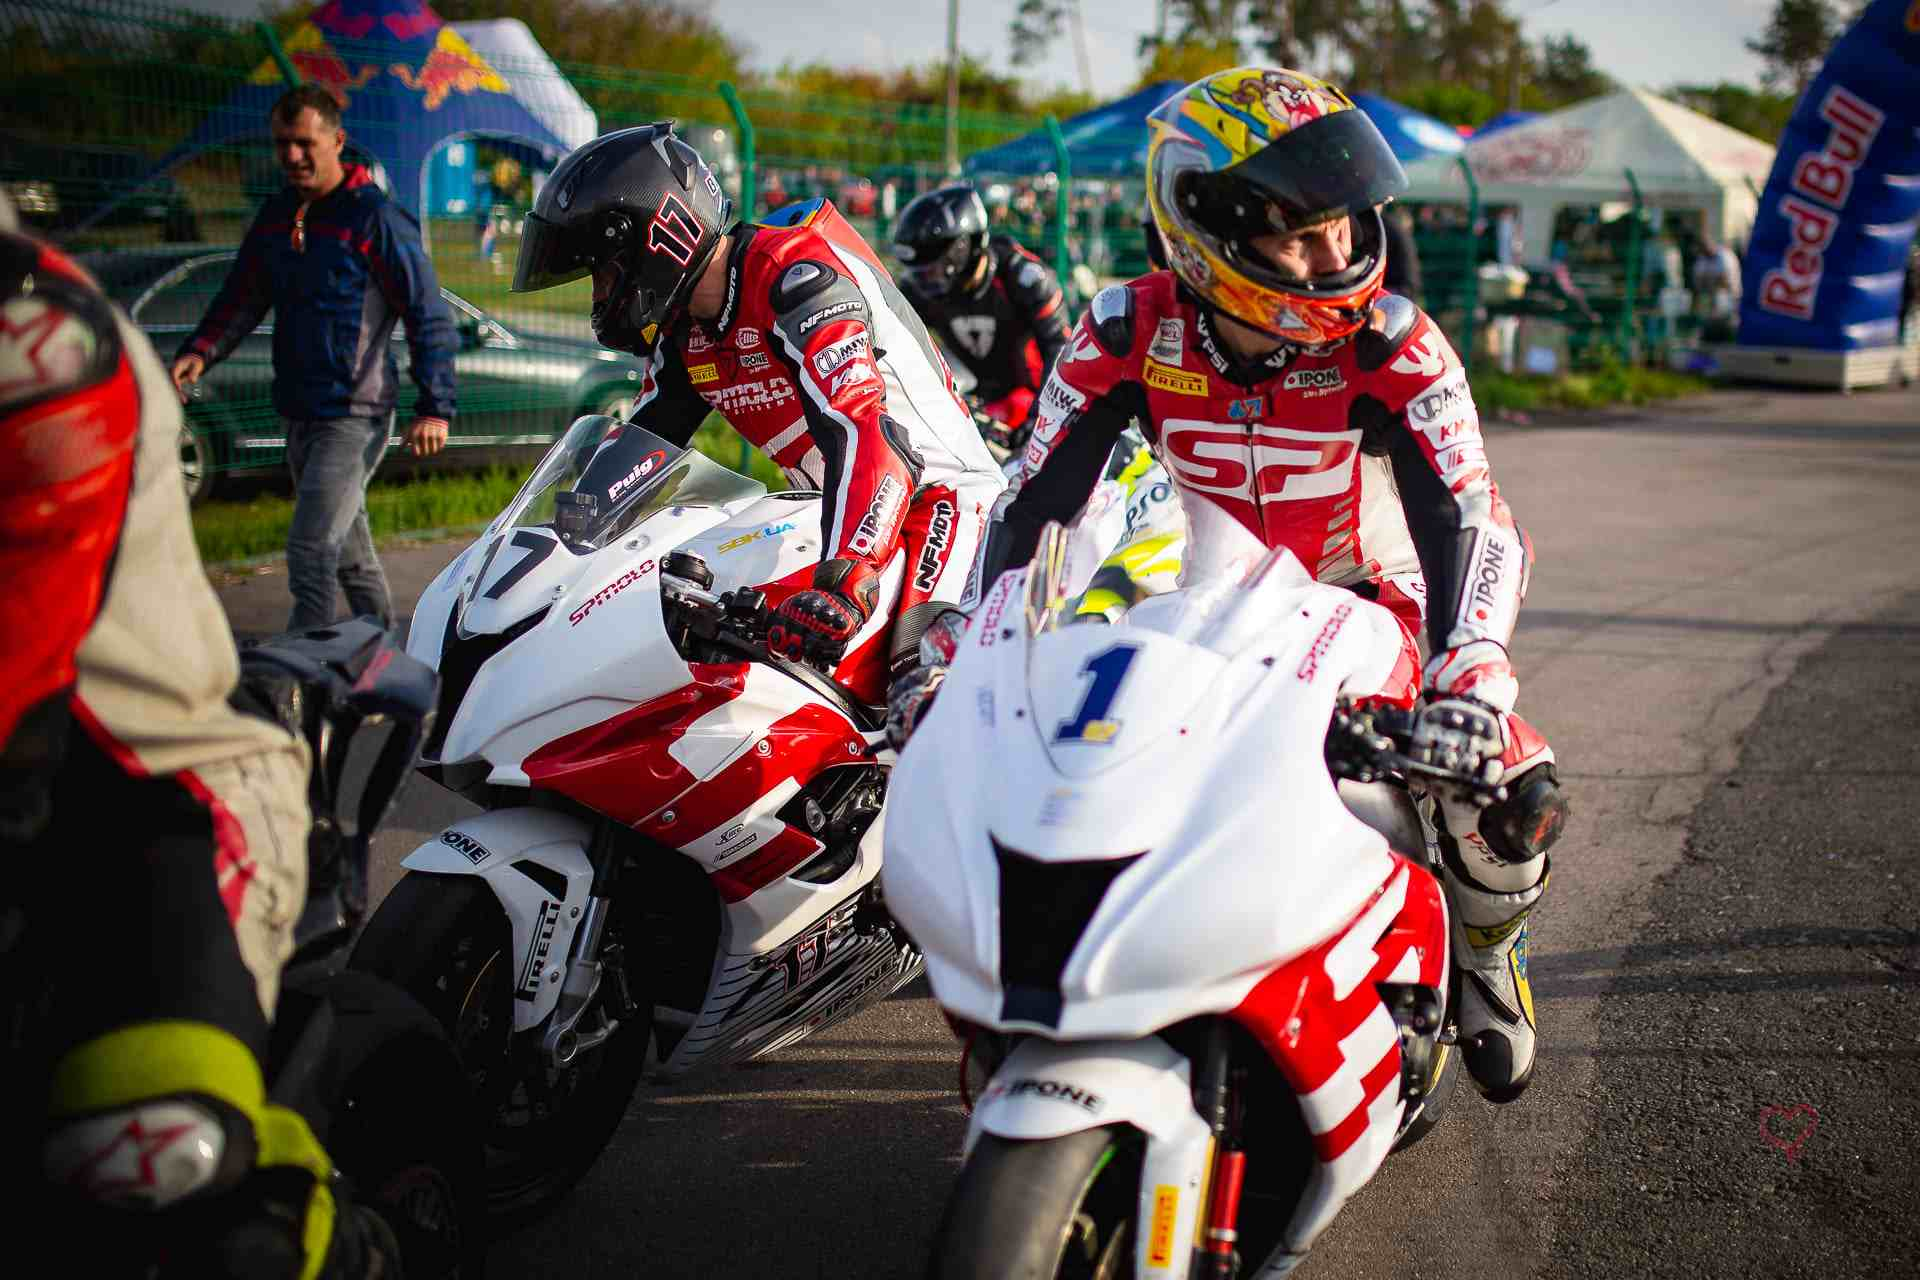 5-6_etap_MotoGPUkraine_142